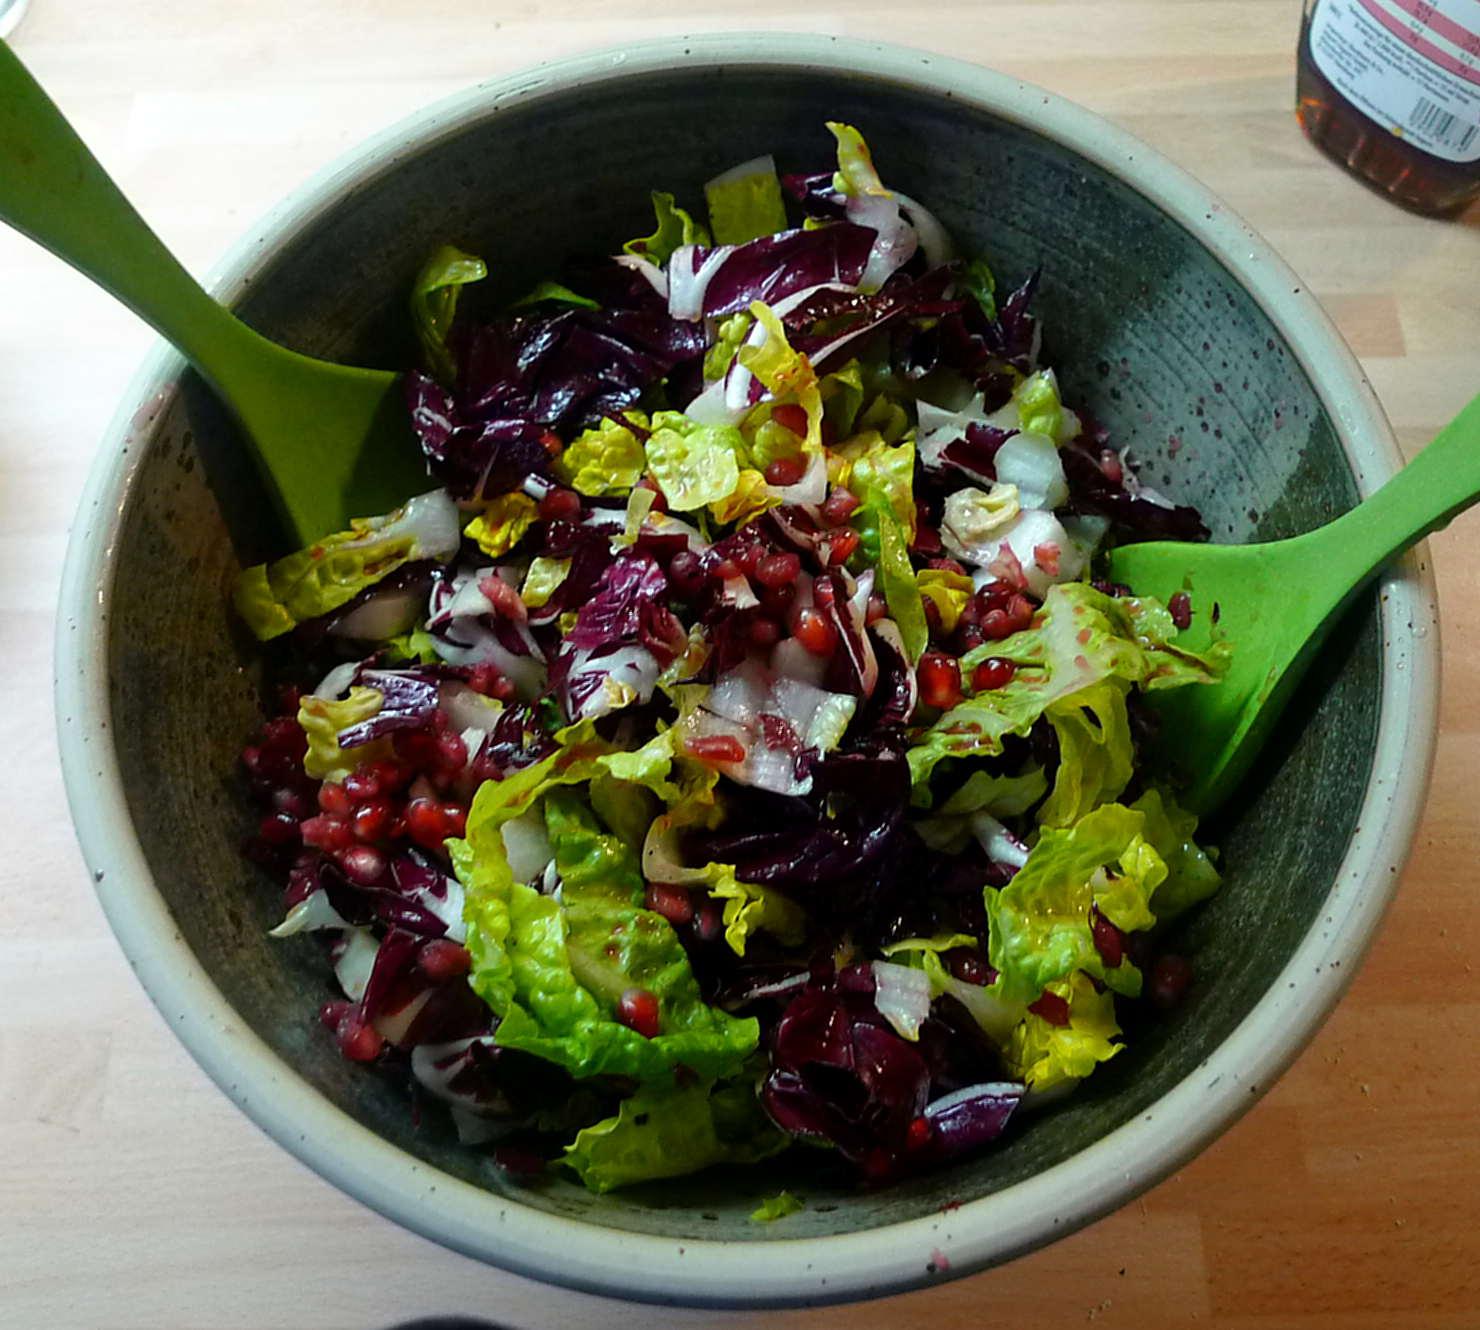 9.2.16 - Zander,Salat,Kartoffel,pescetarisch (1c) (2a)